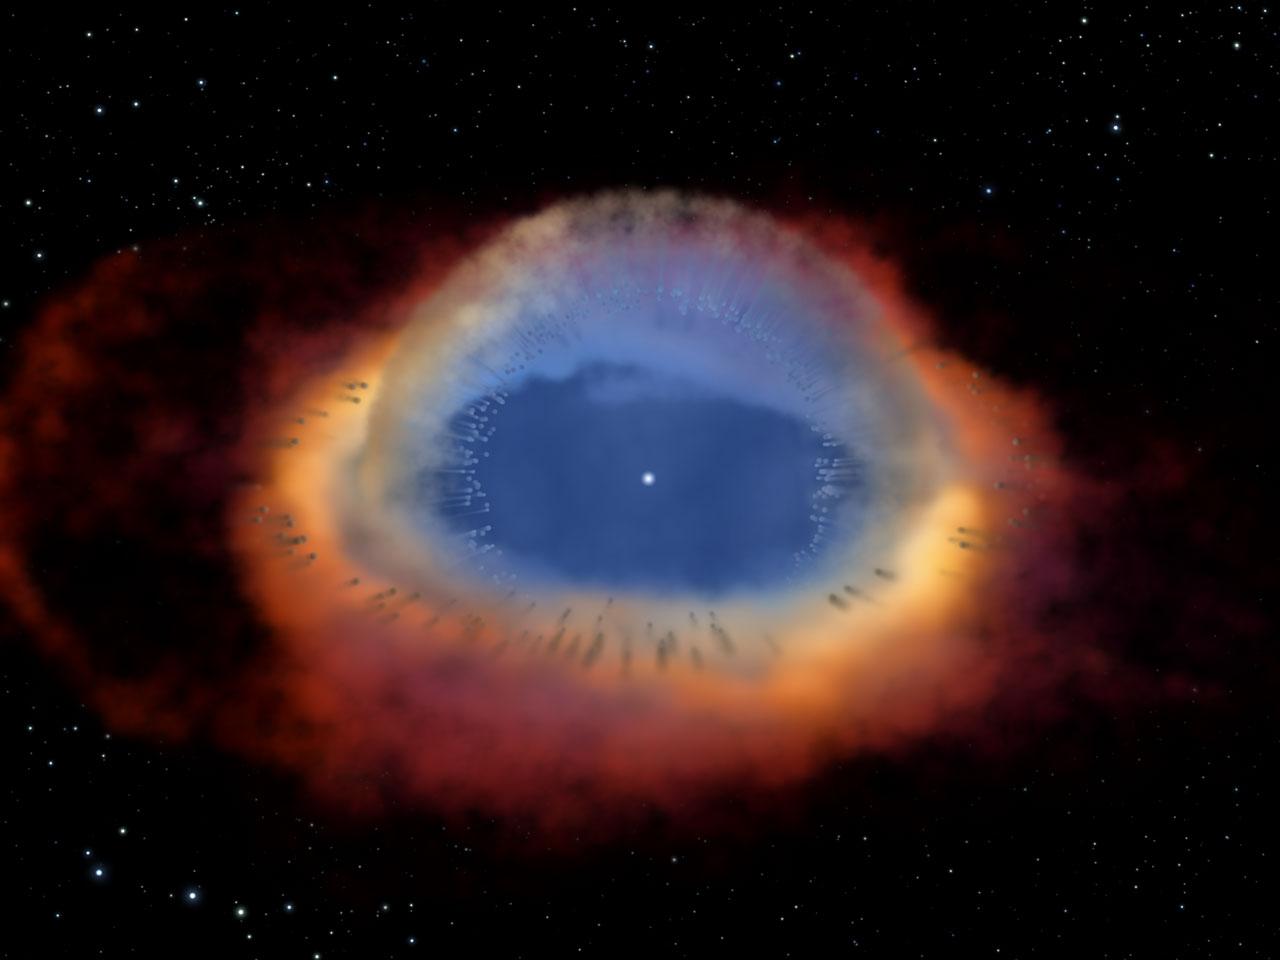 Helix Nebula Model (artist's impression)